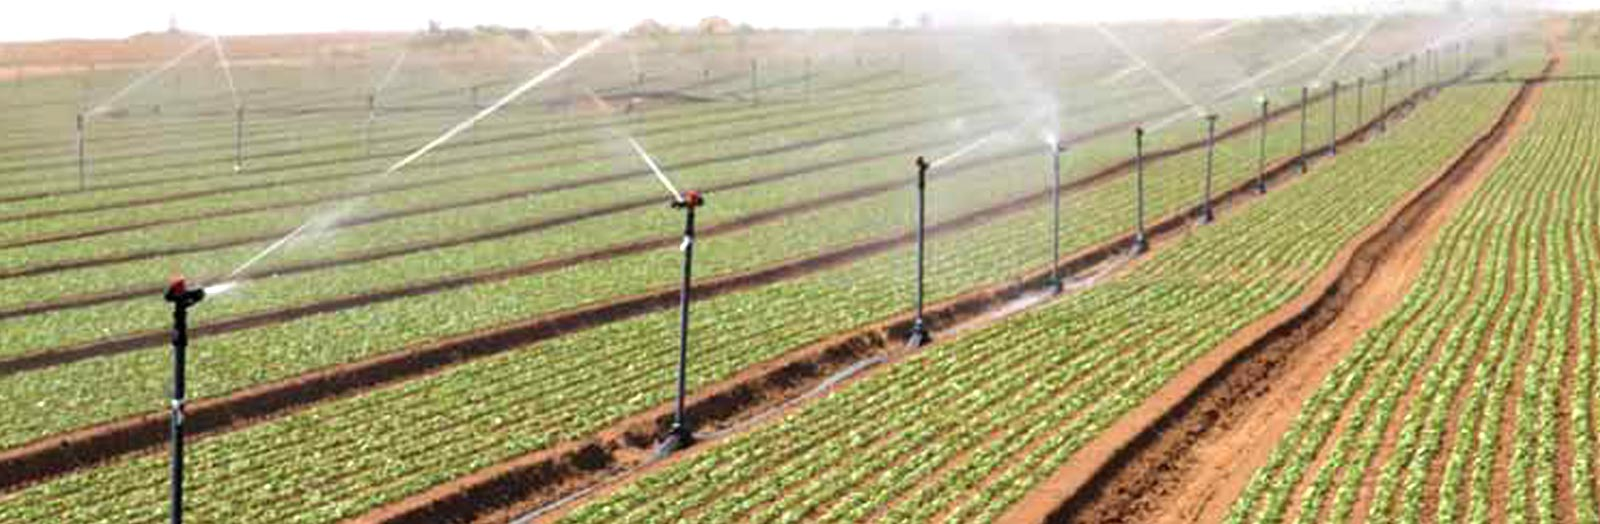 Sprinkler Irrigation Systems Valve Wiring Diagram Water System Installation Prevnext